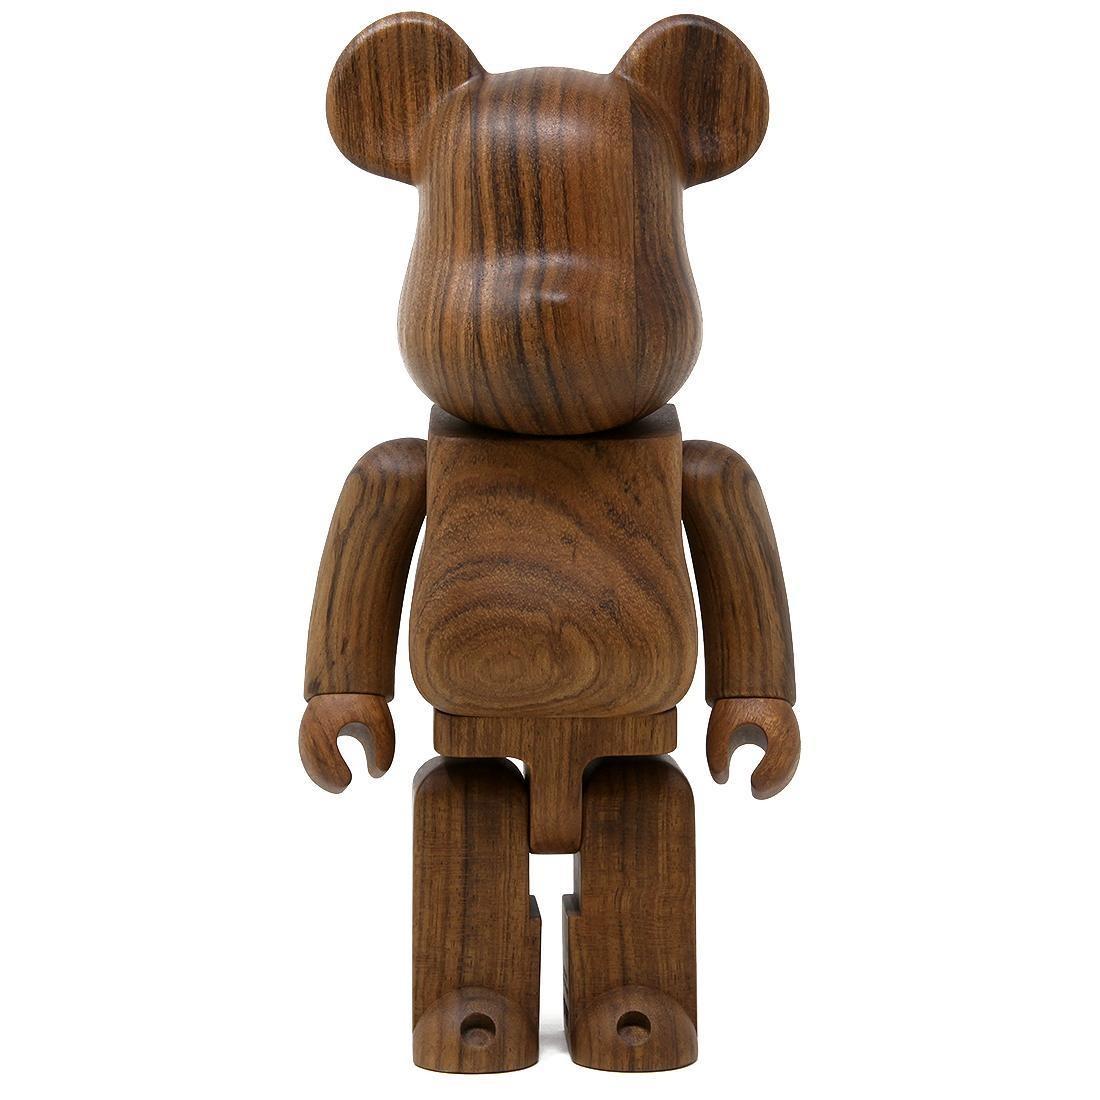 Medicom Karimoku Ovangkol 400% Bearbrick Figure (brown)